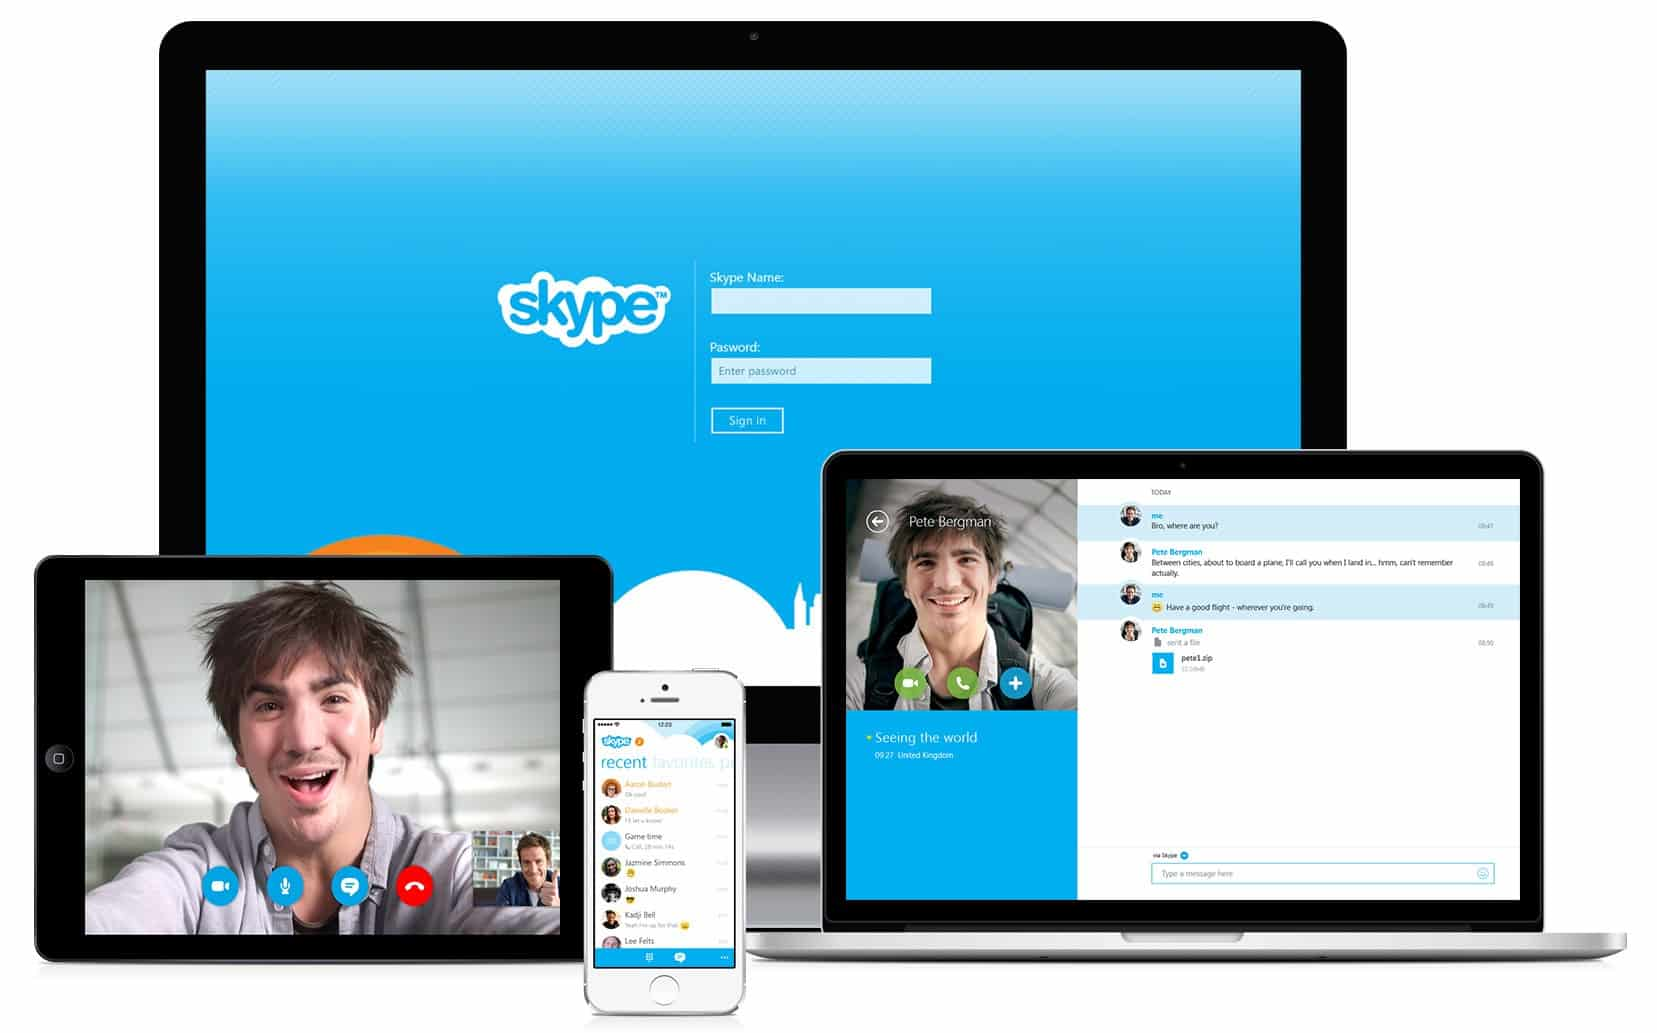 skype platform